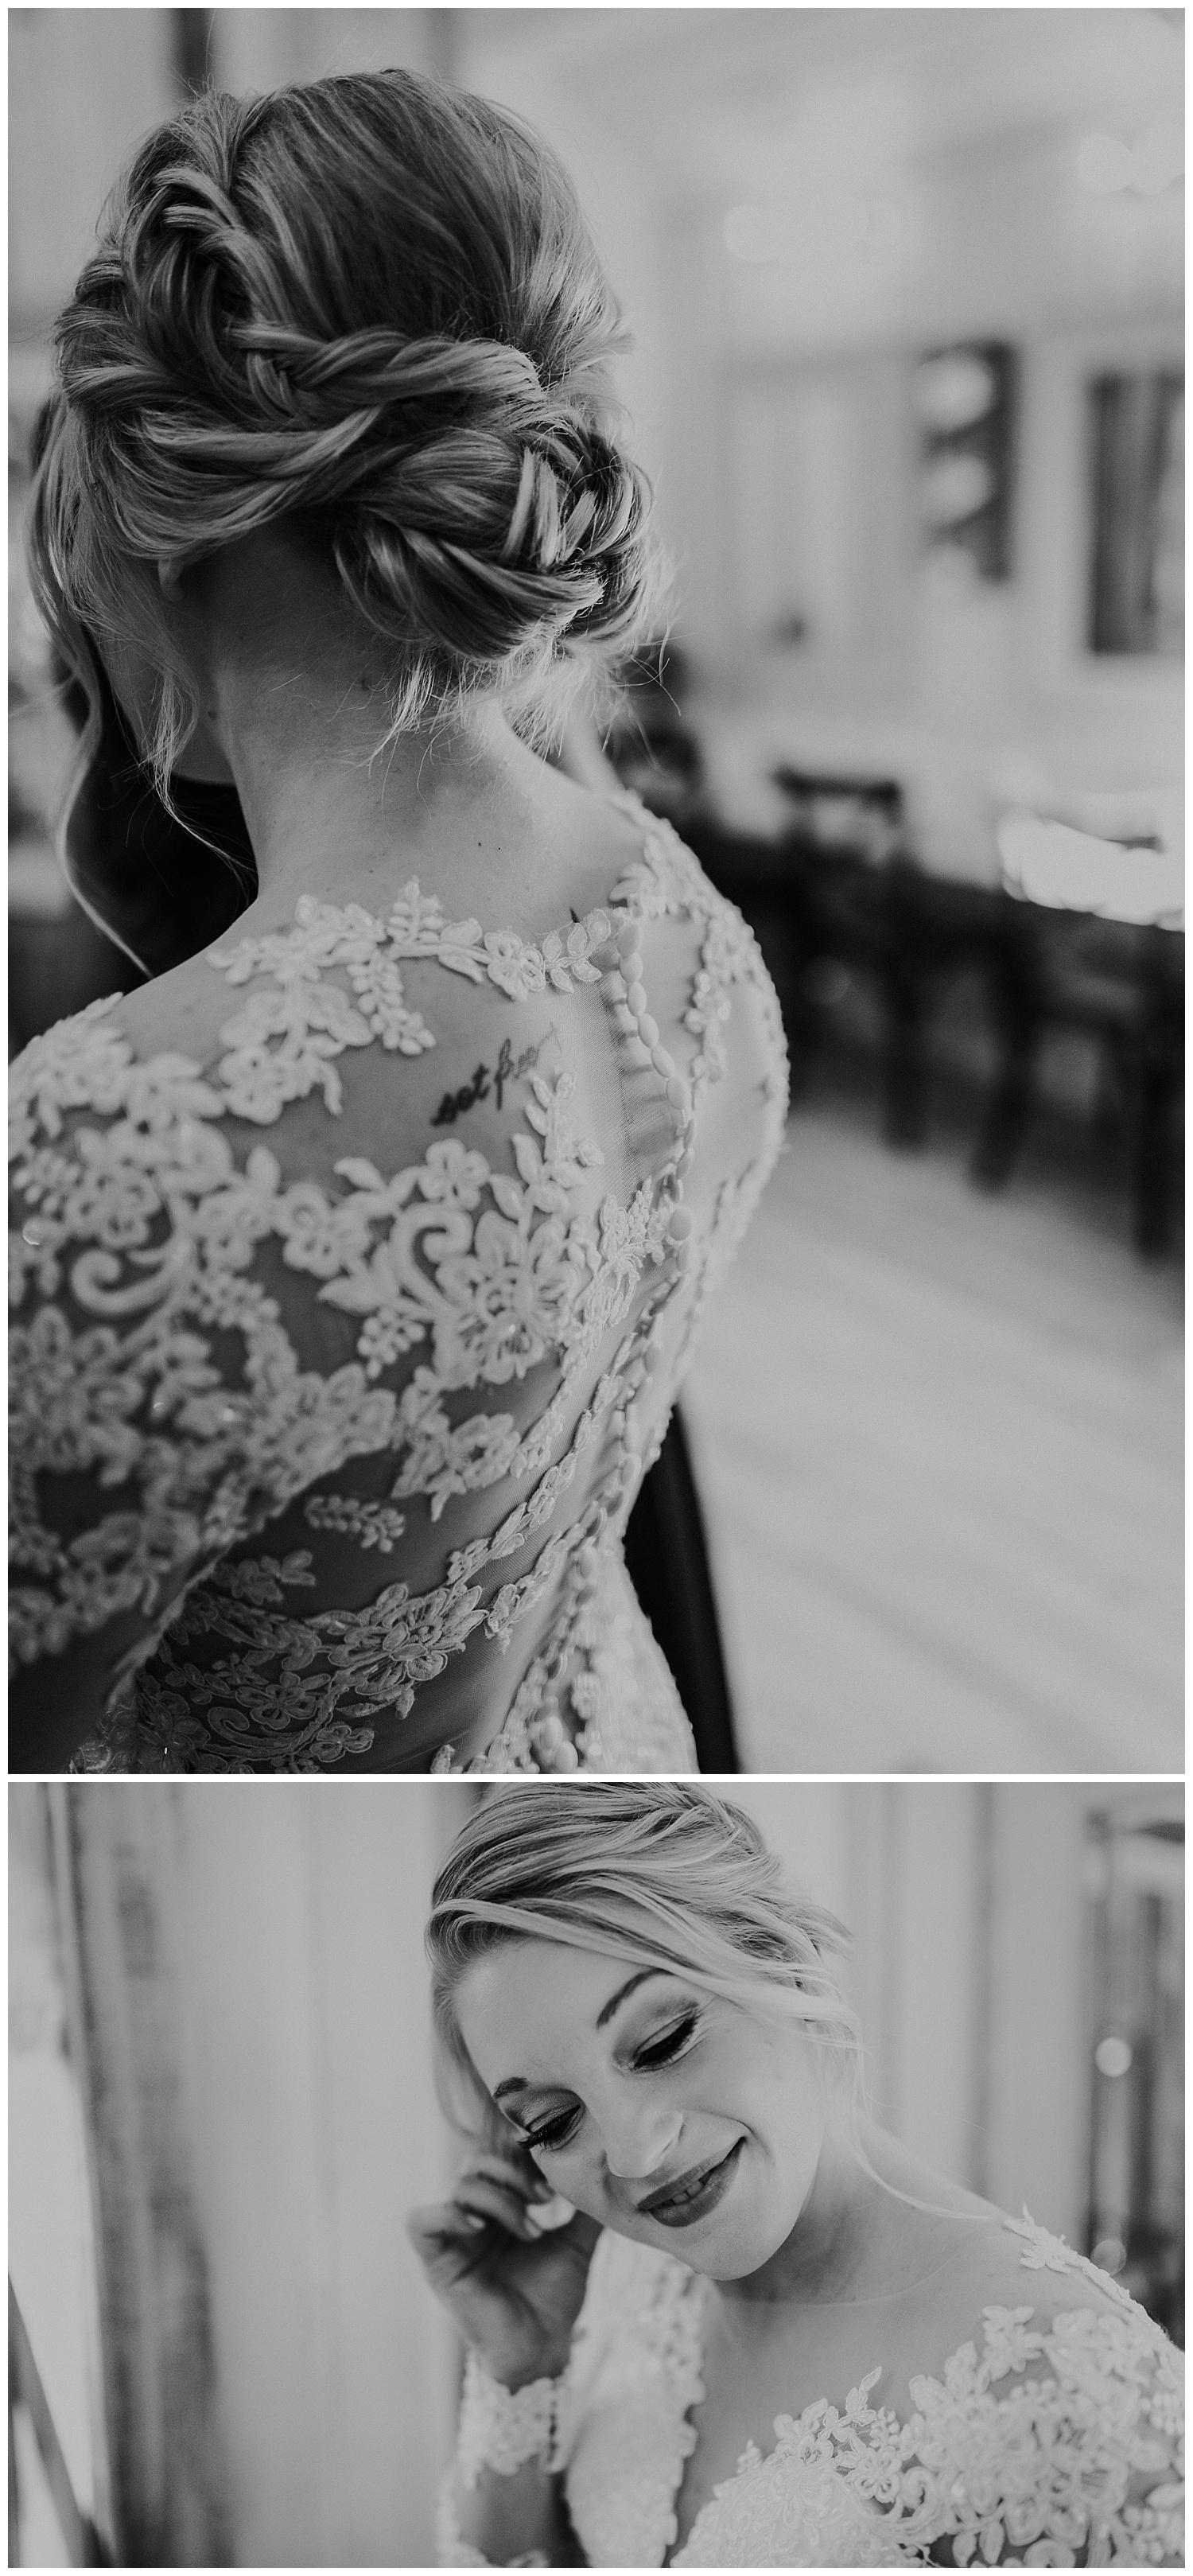 Laken-Mackenzie-Photography-Palm-Whispering-Oaks-Wedding-Venue-Dallas-Wedding-Photographer09.jpg